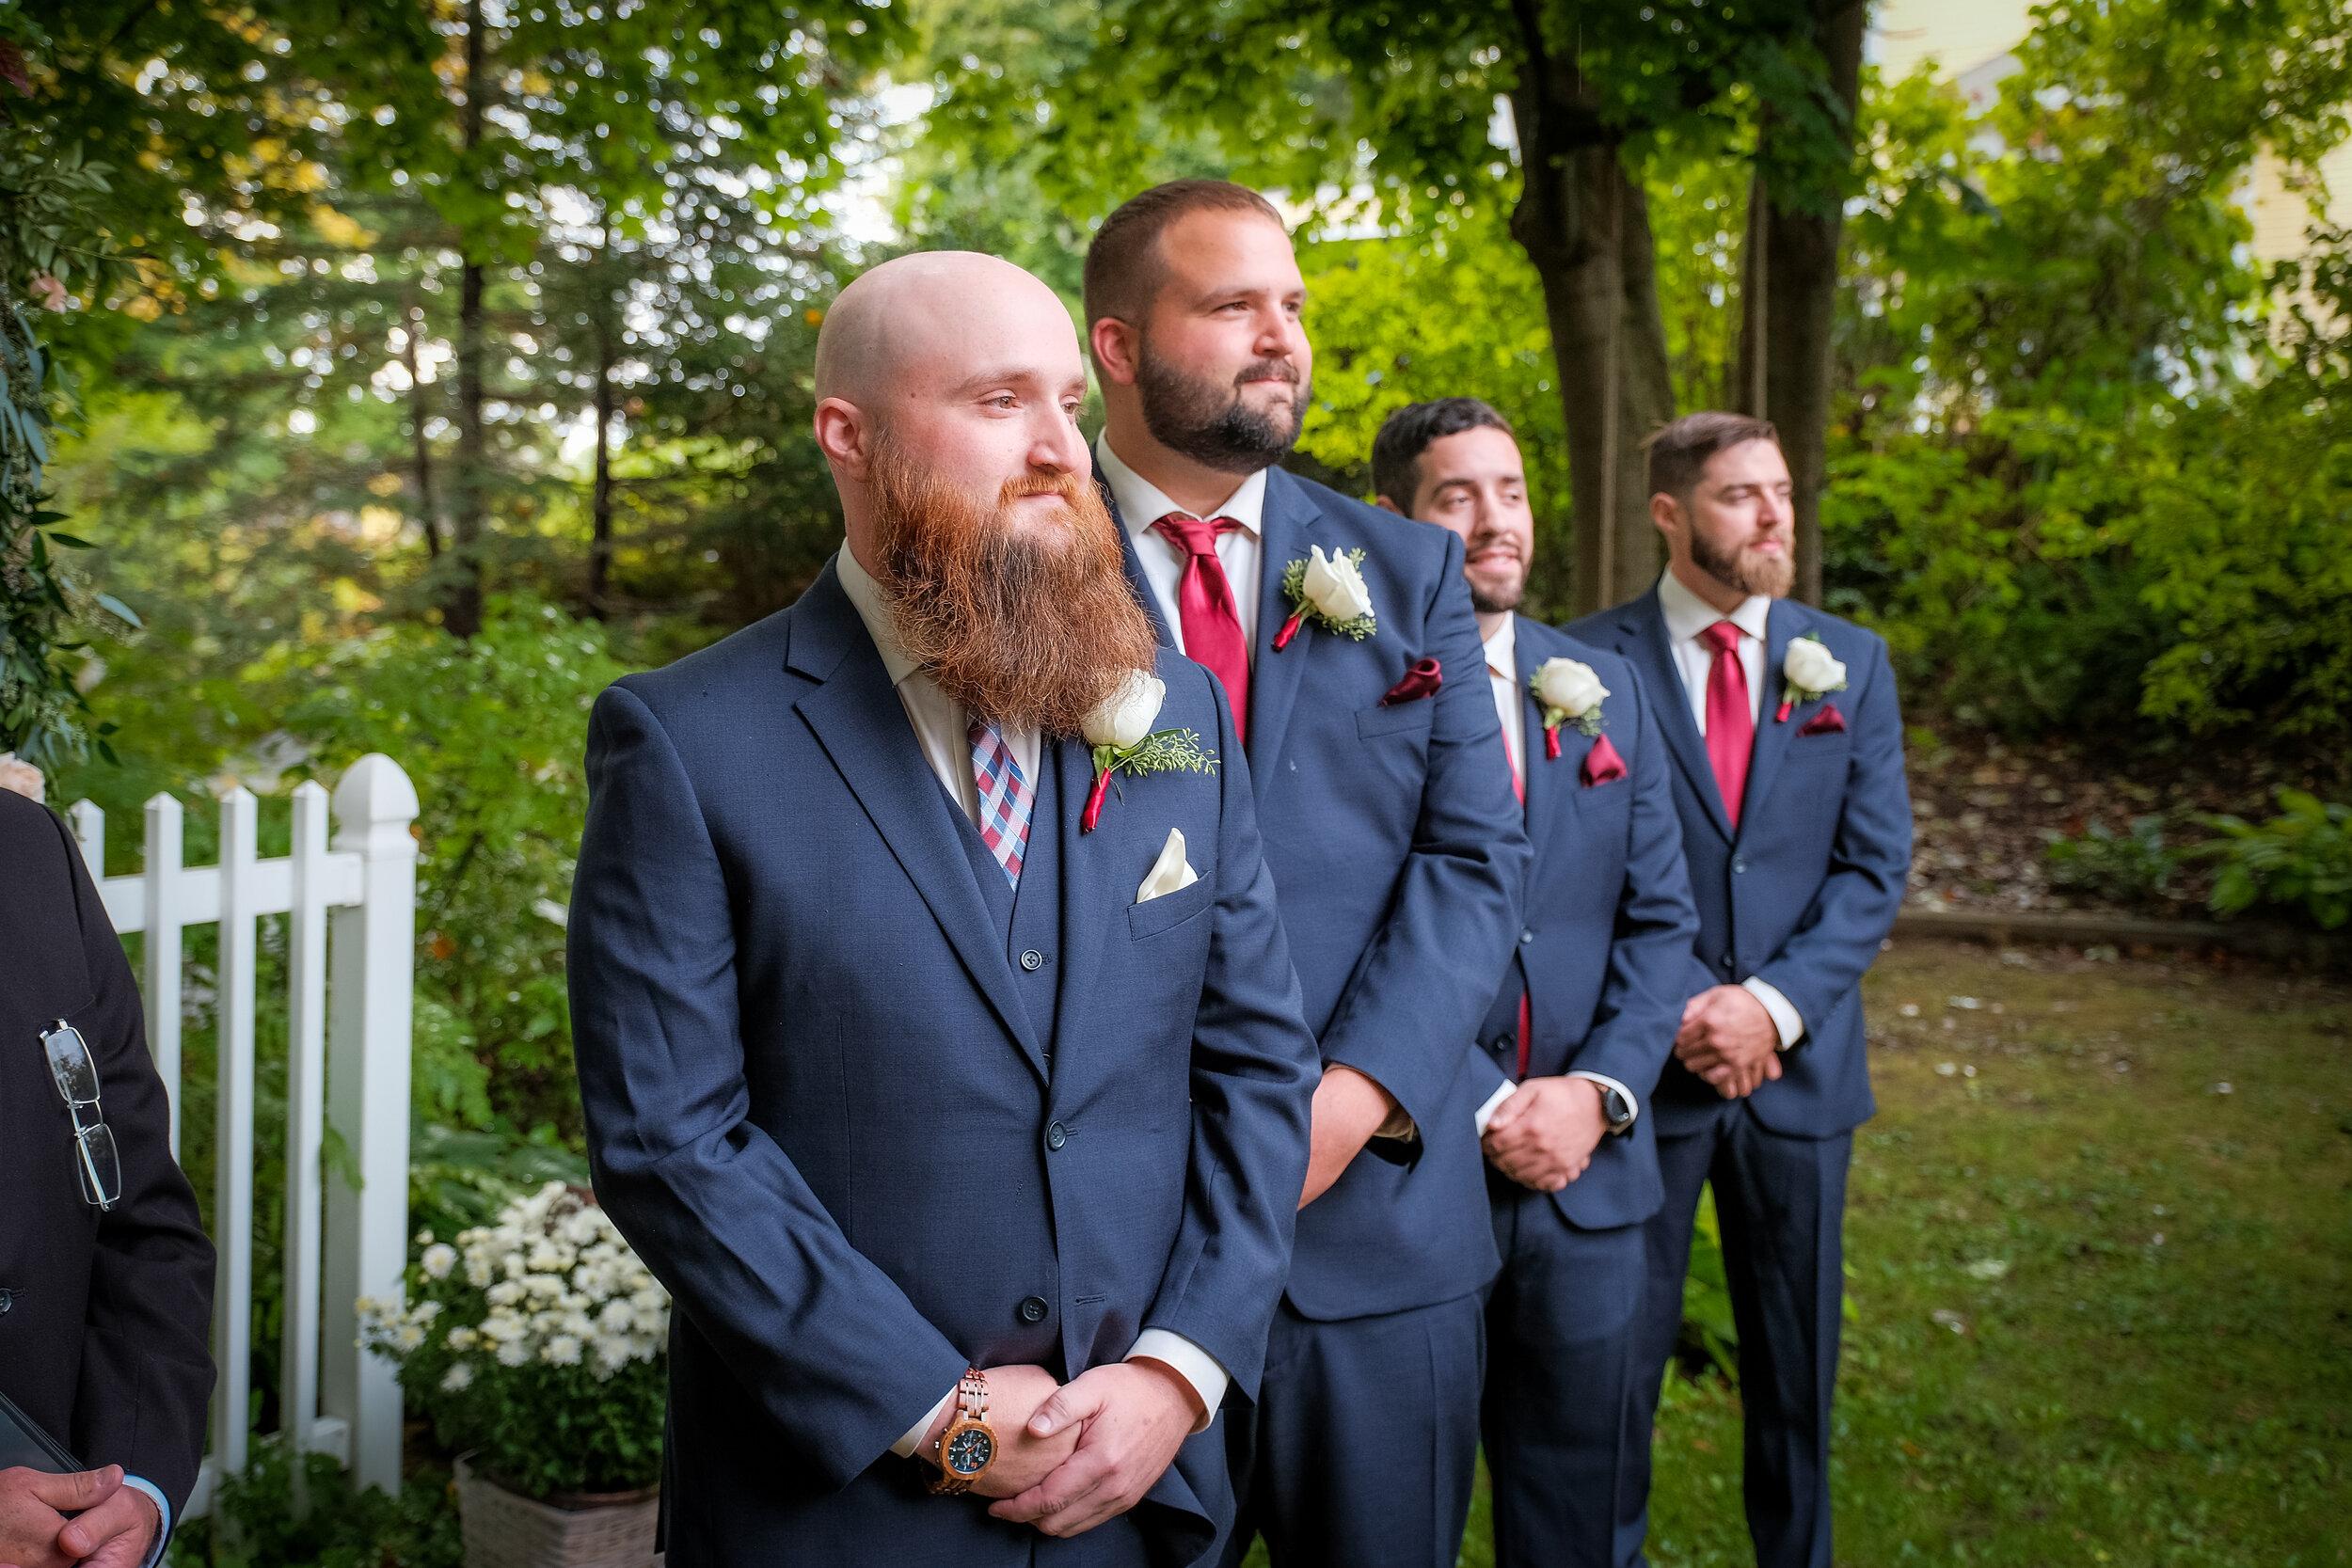 three-chimneys-inn-wedding-photography-558.jpg